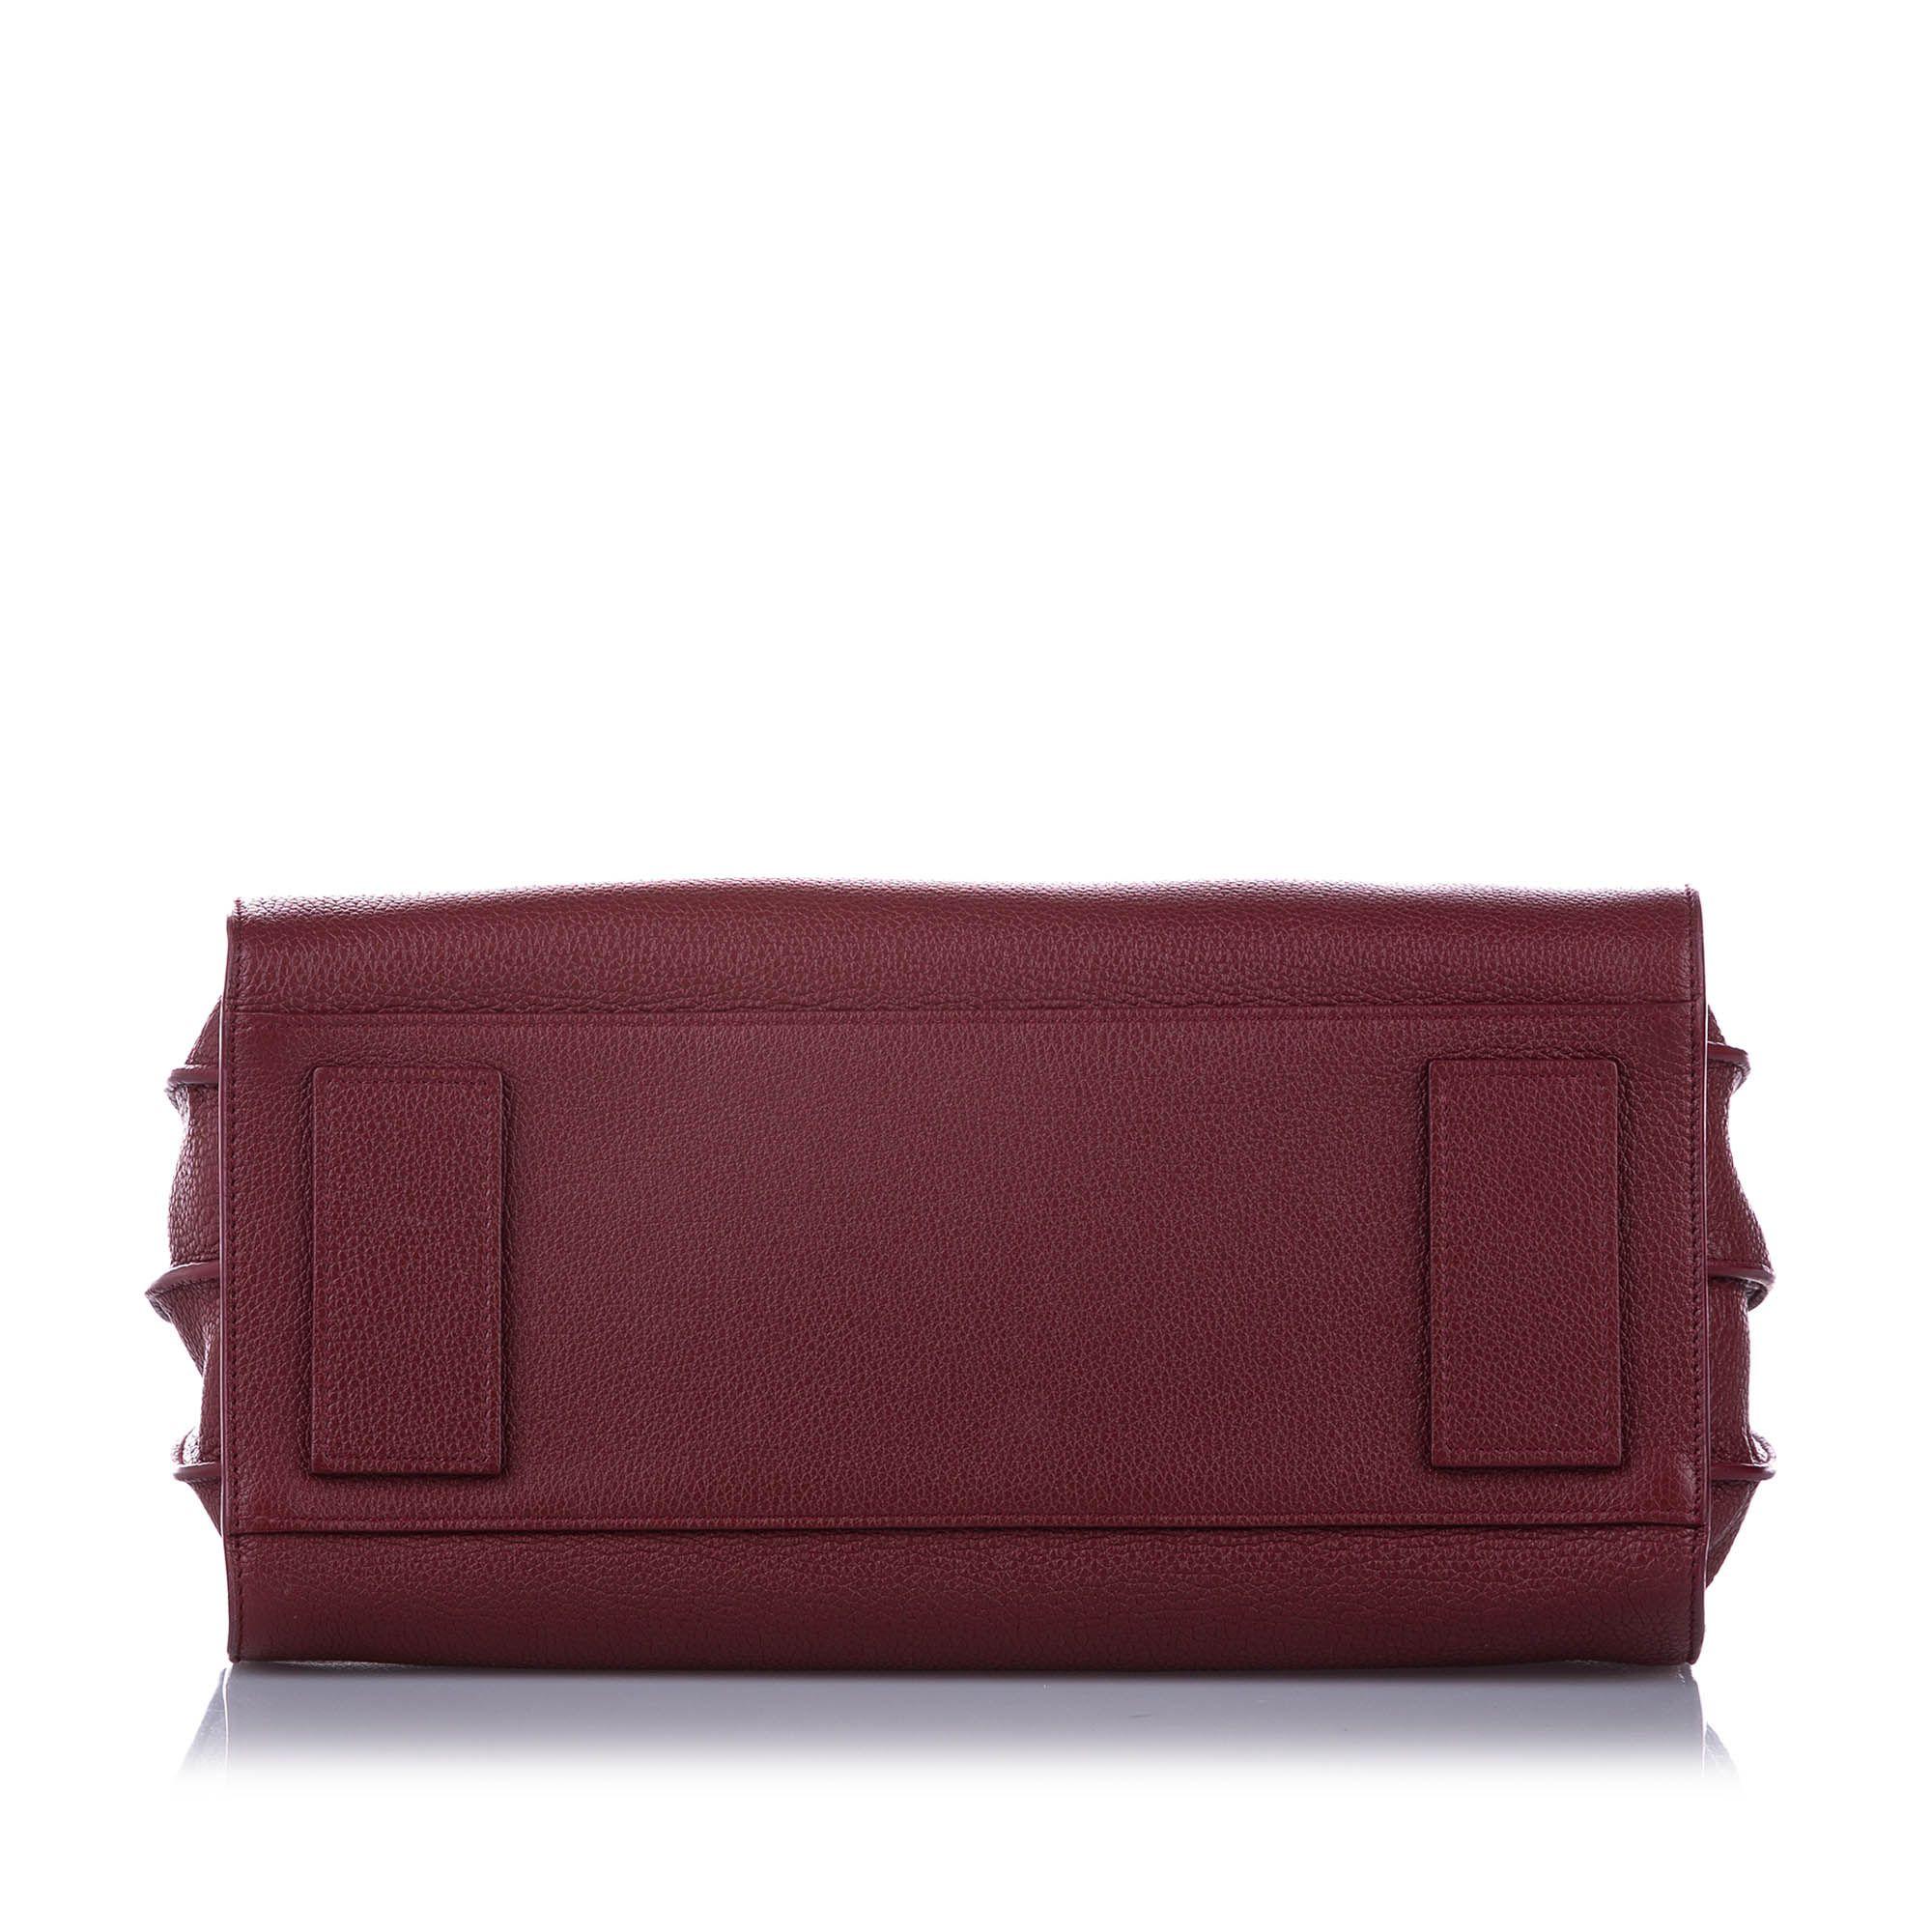 Vintage YSL Small Sac de Jour Leather Satchel Red